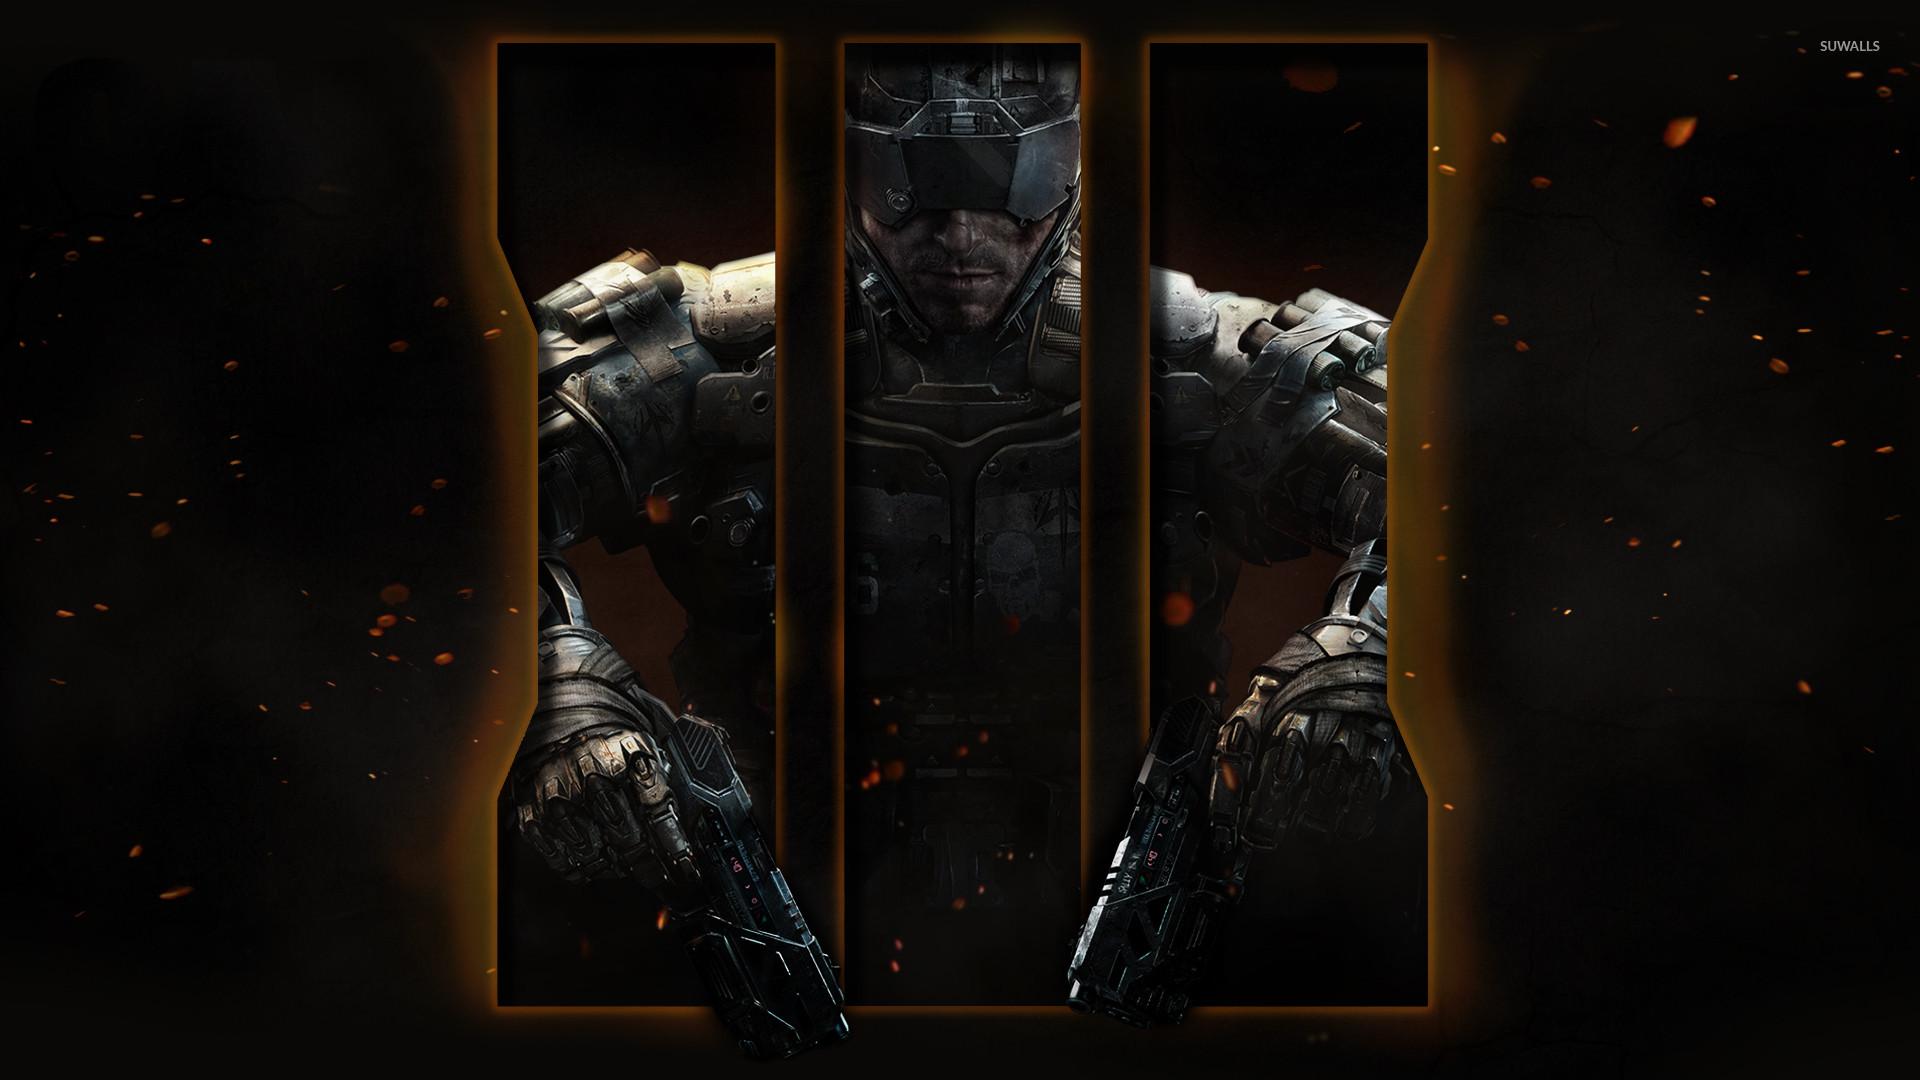 Call of Duty: Black Ops III [2] wallpaper jpg